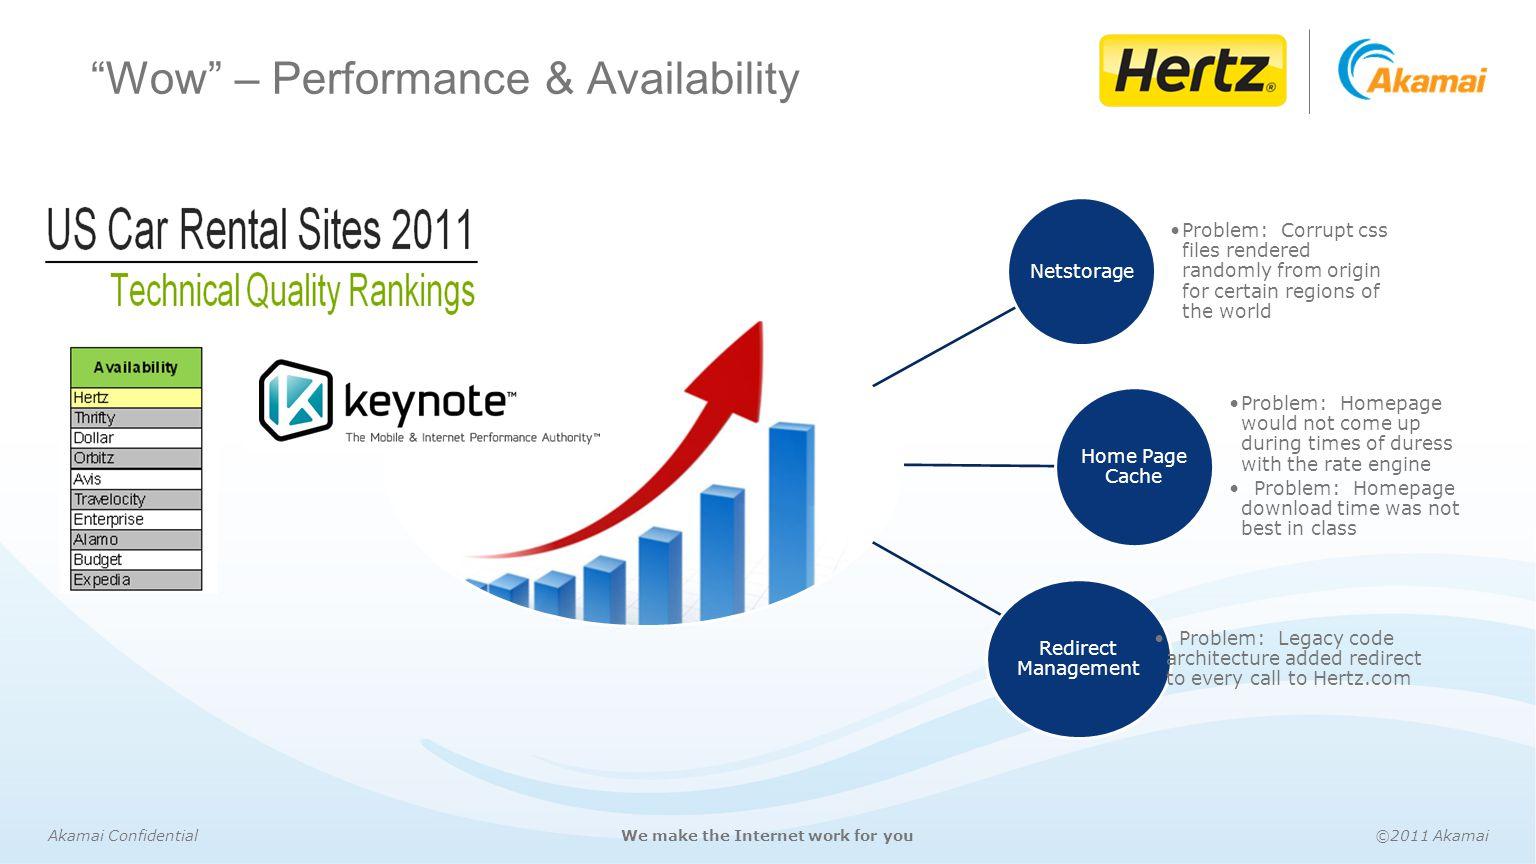 Wow – Performance & Availability